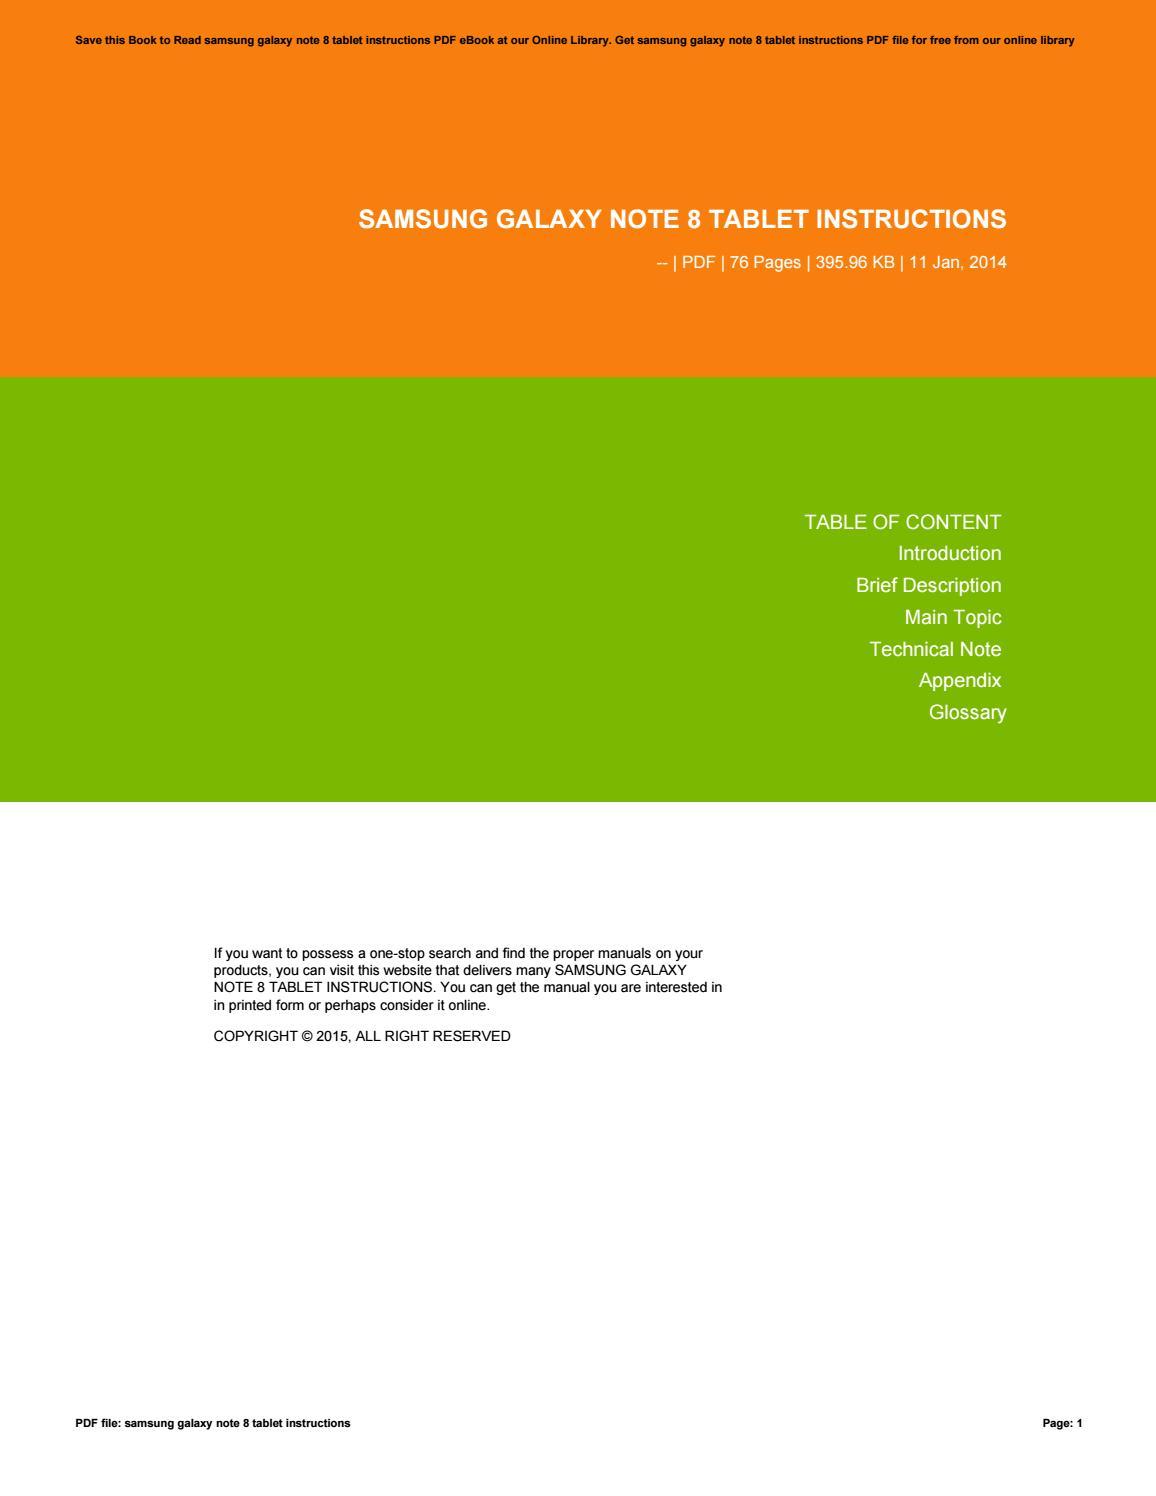 ... service manual rh picclick Array - samsung manuals for tablets ebook rh  samsung manuals for tablets ebook angelayu us